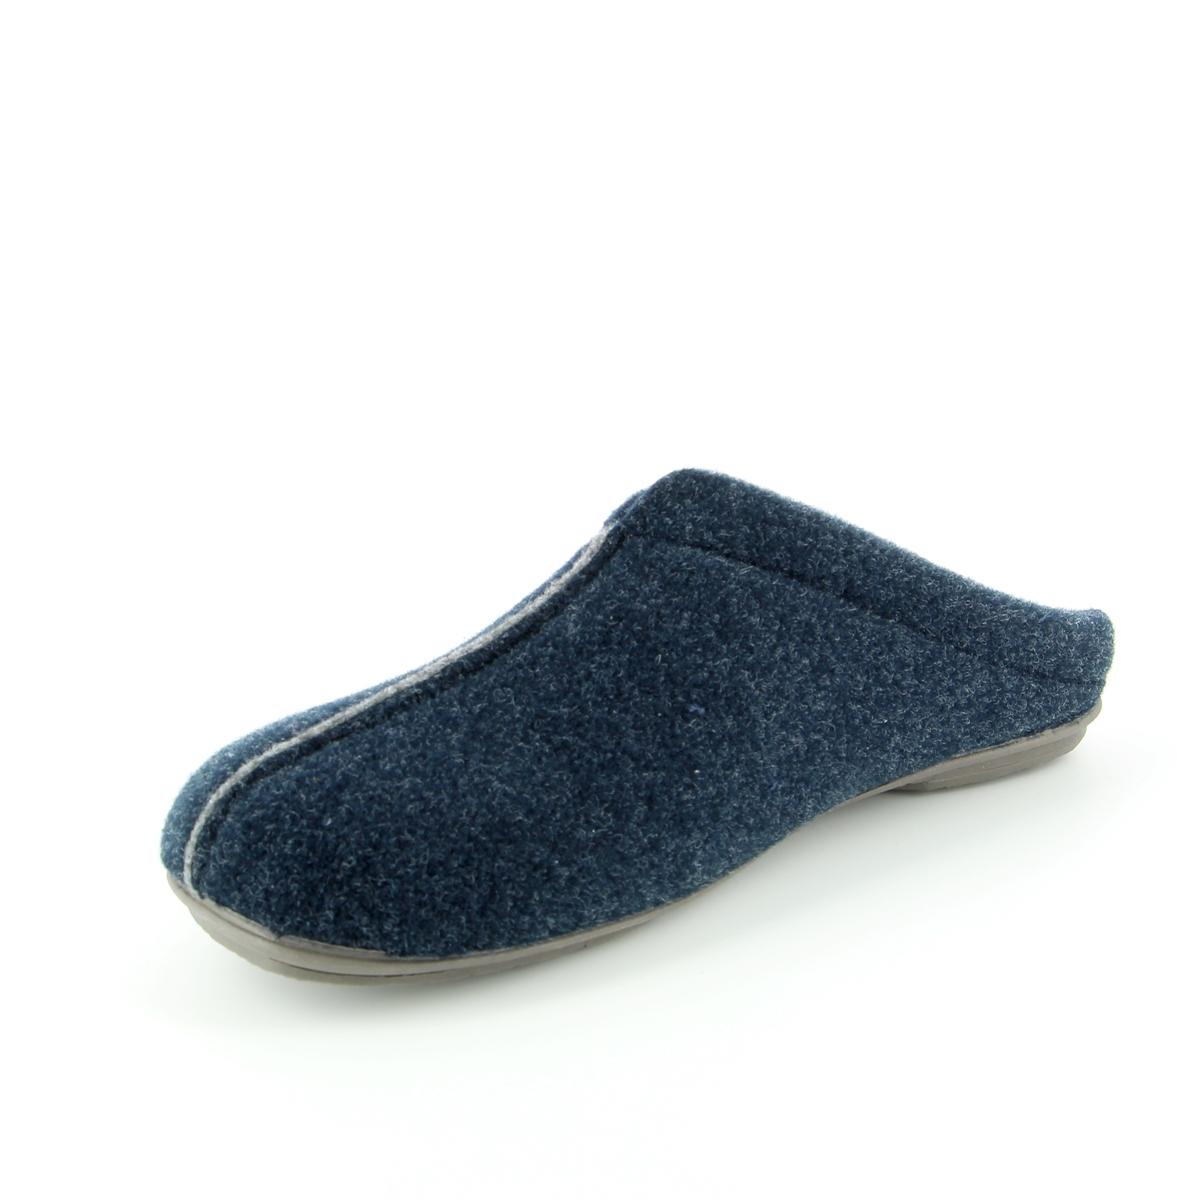 Cypres Pantoufles bleu